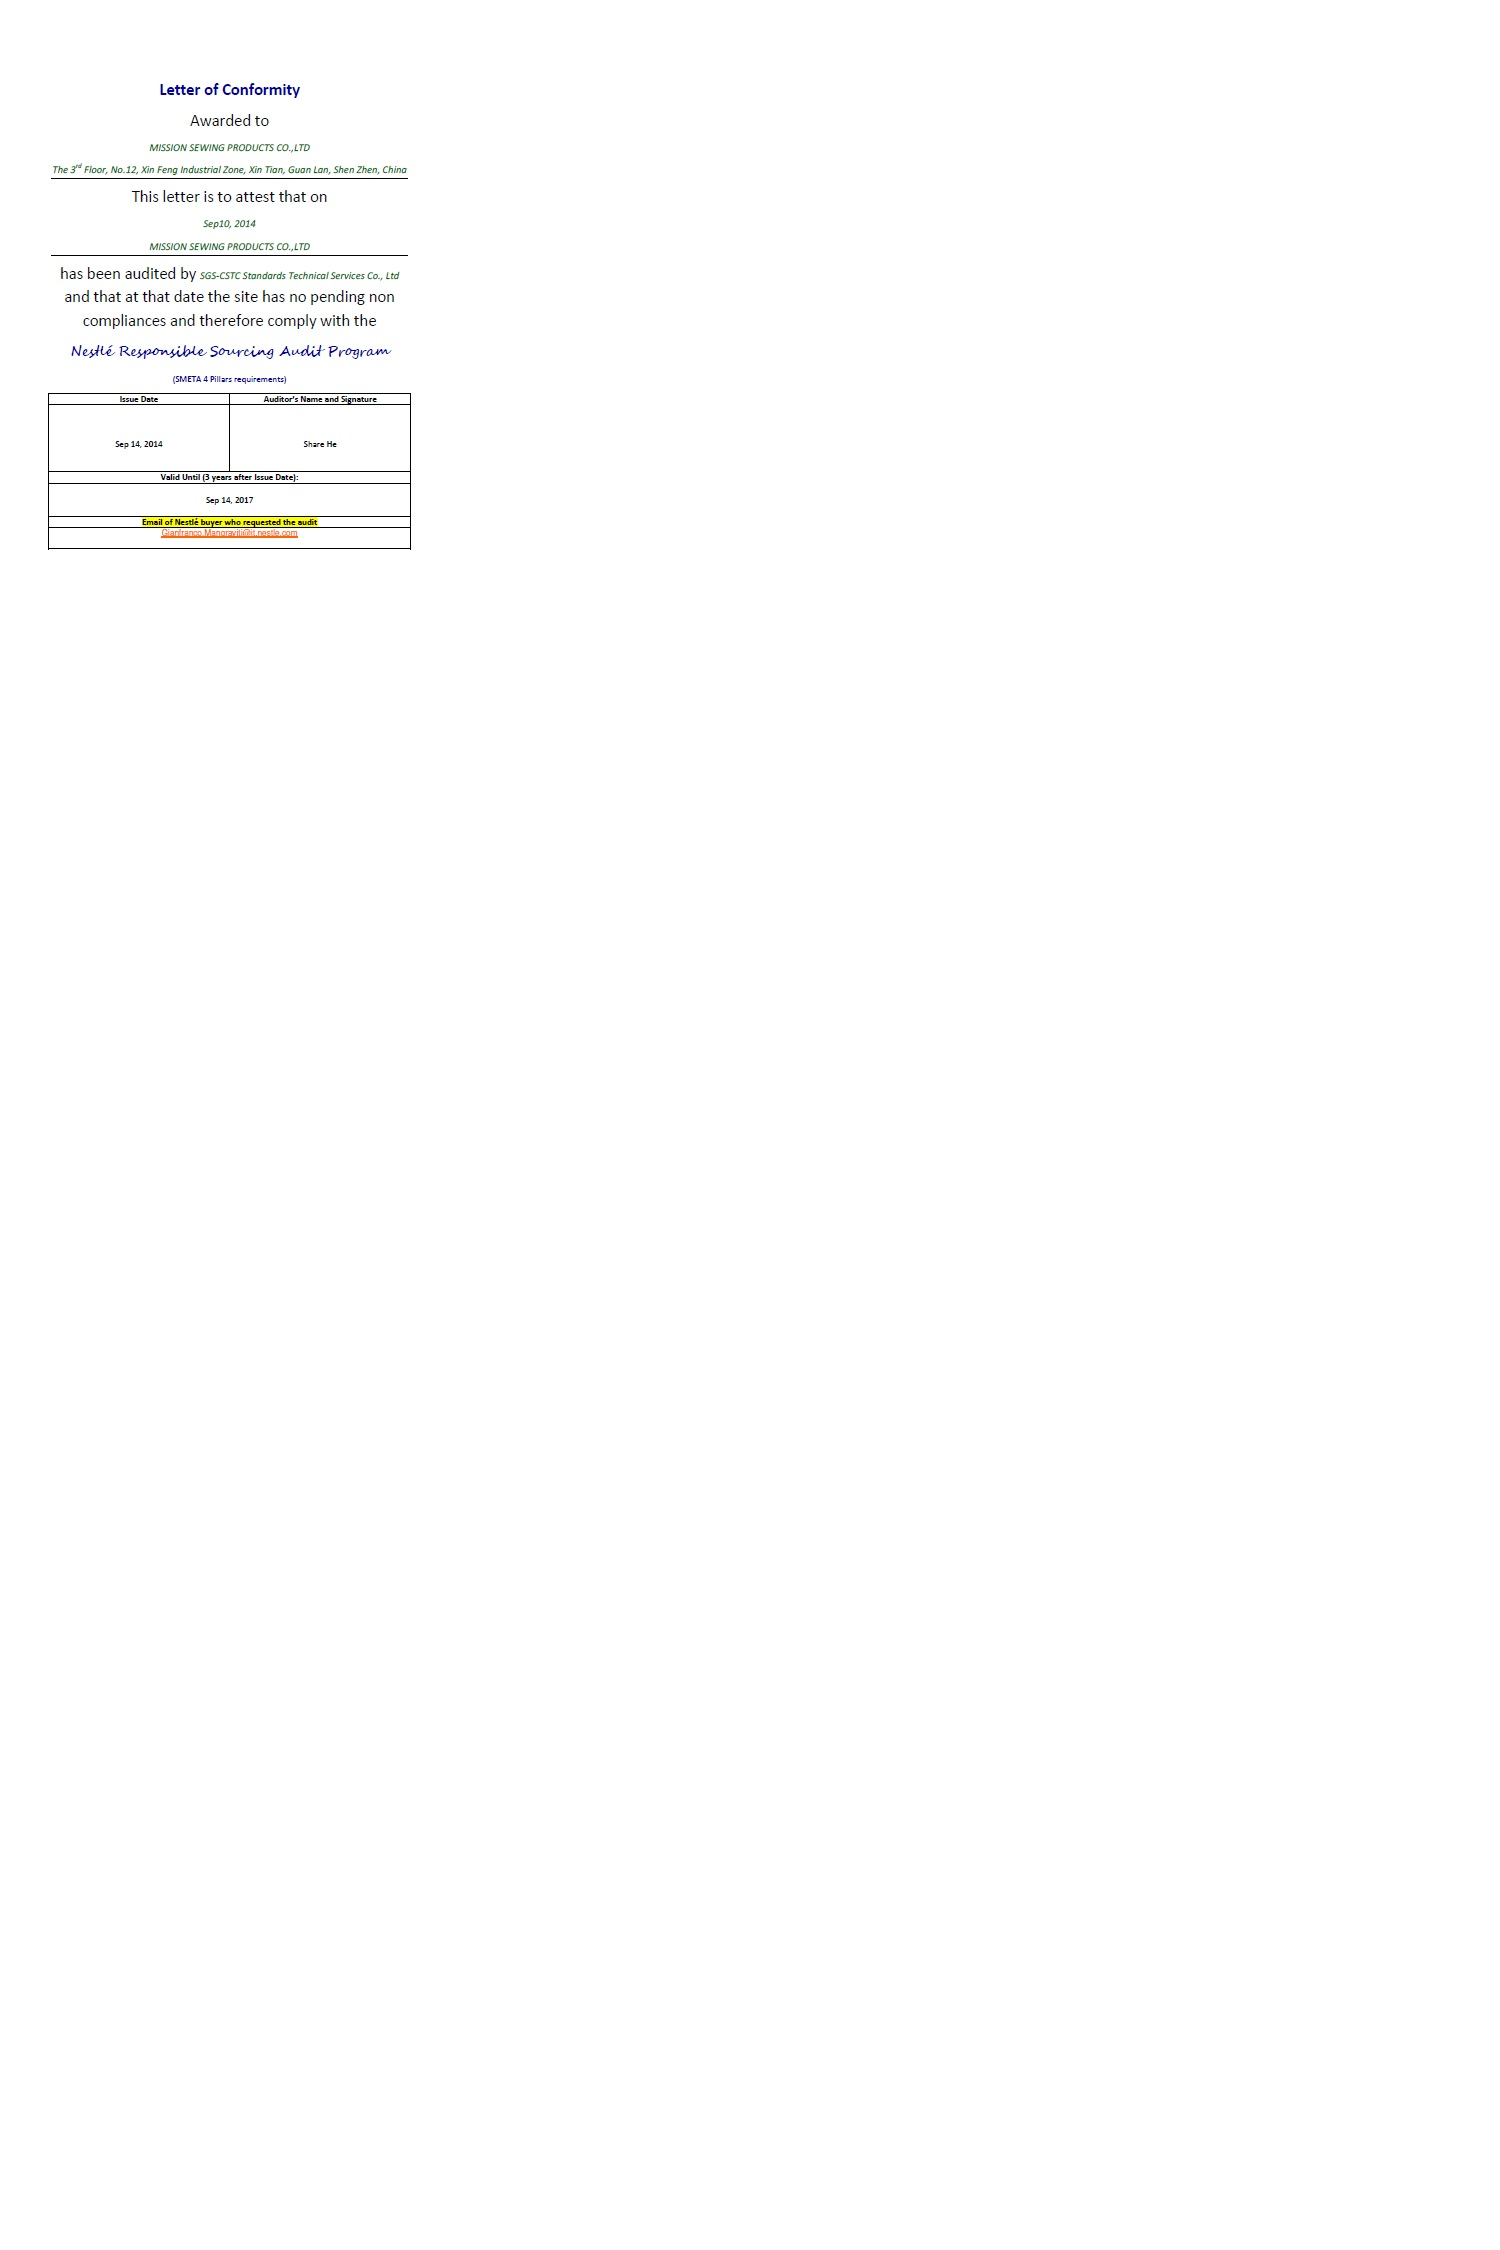 Got Oils Essential Keychain Case For 8 Vials 1 2 5 8 Drams View